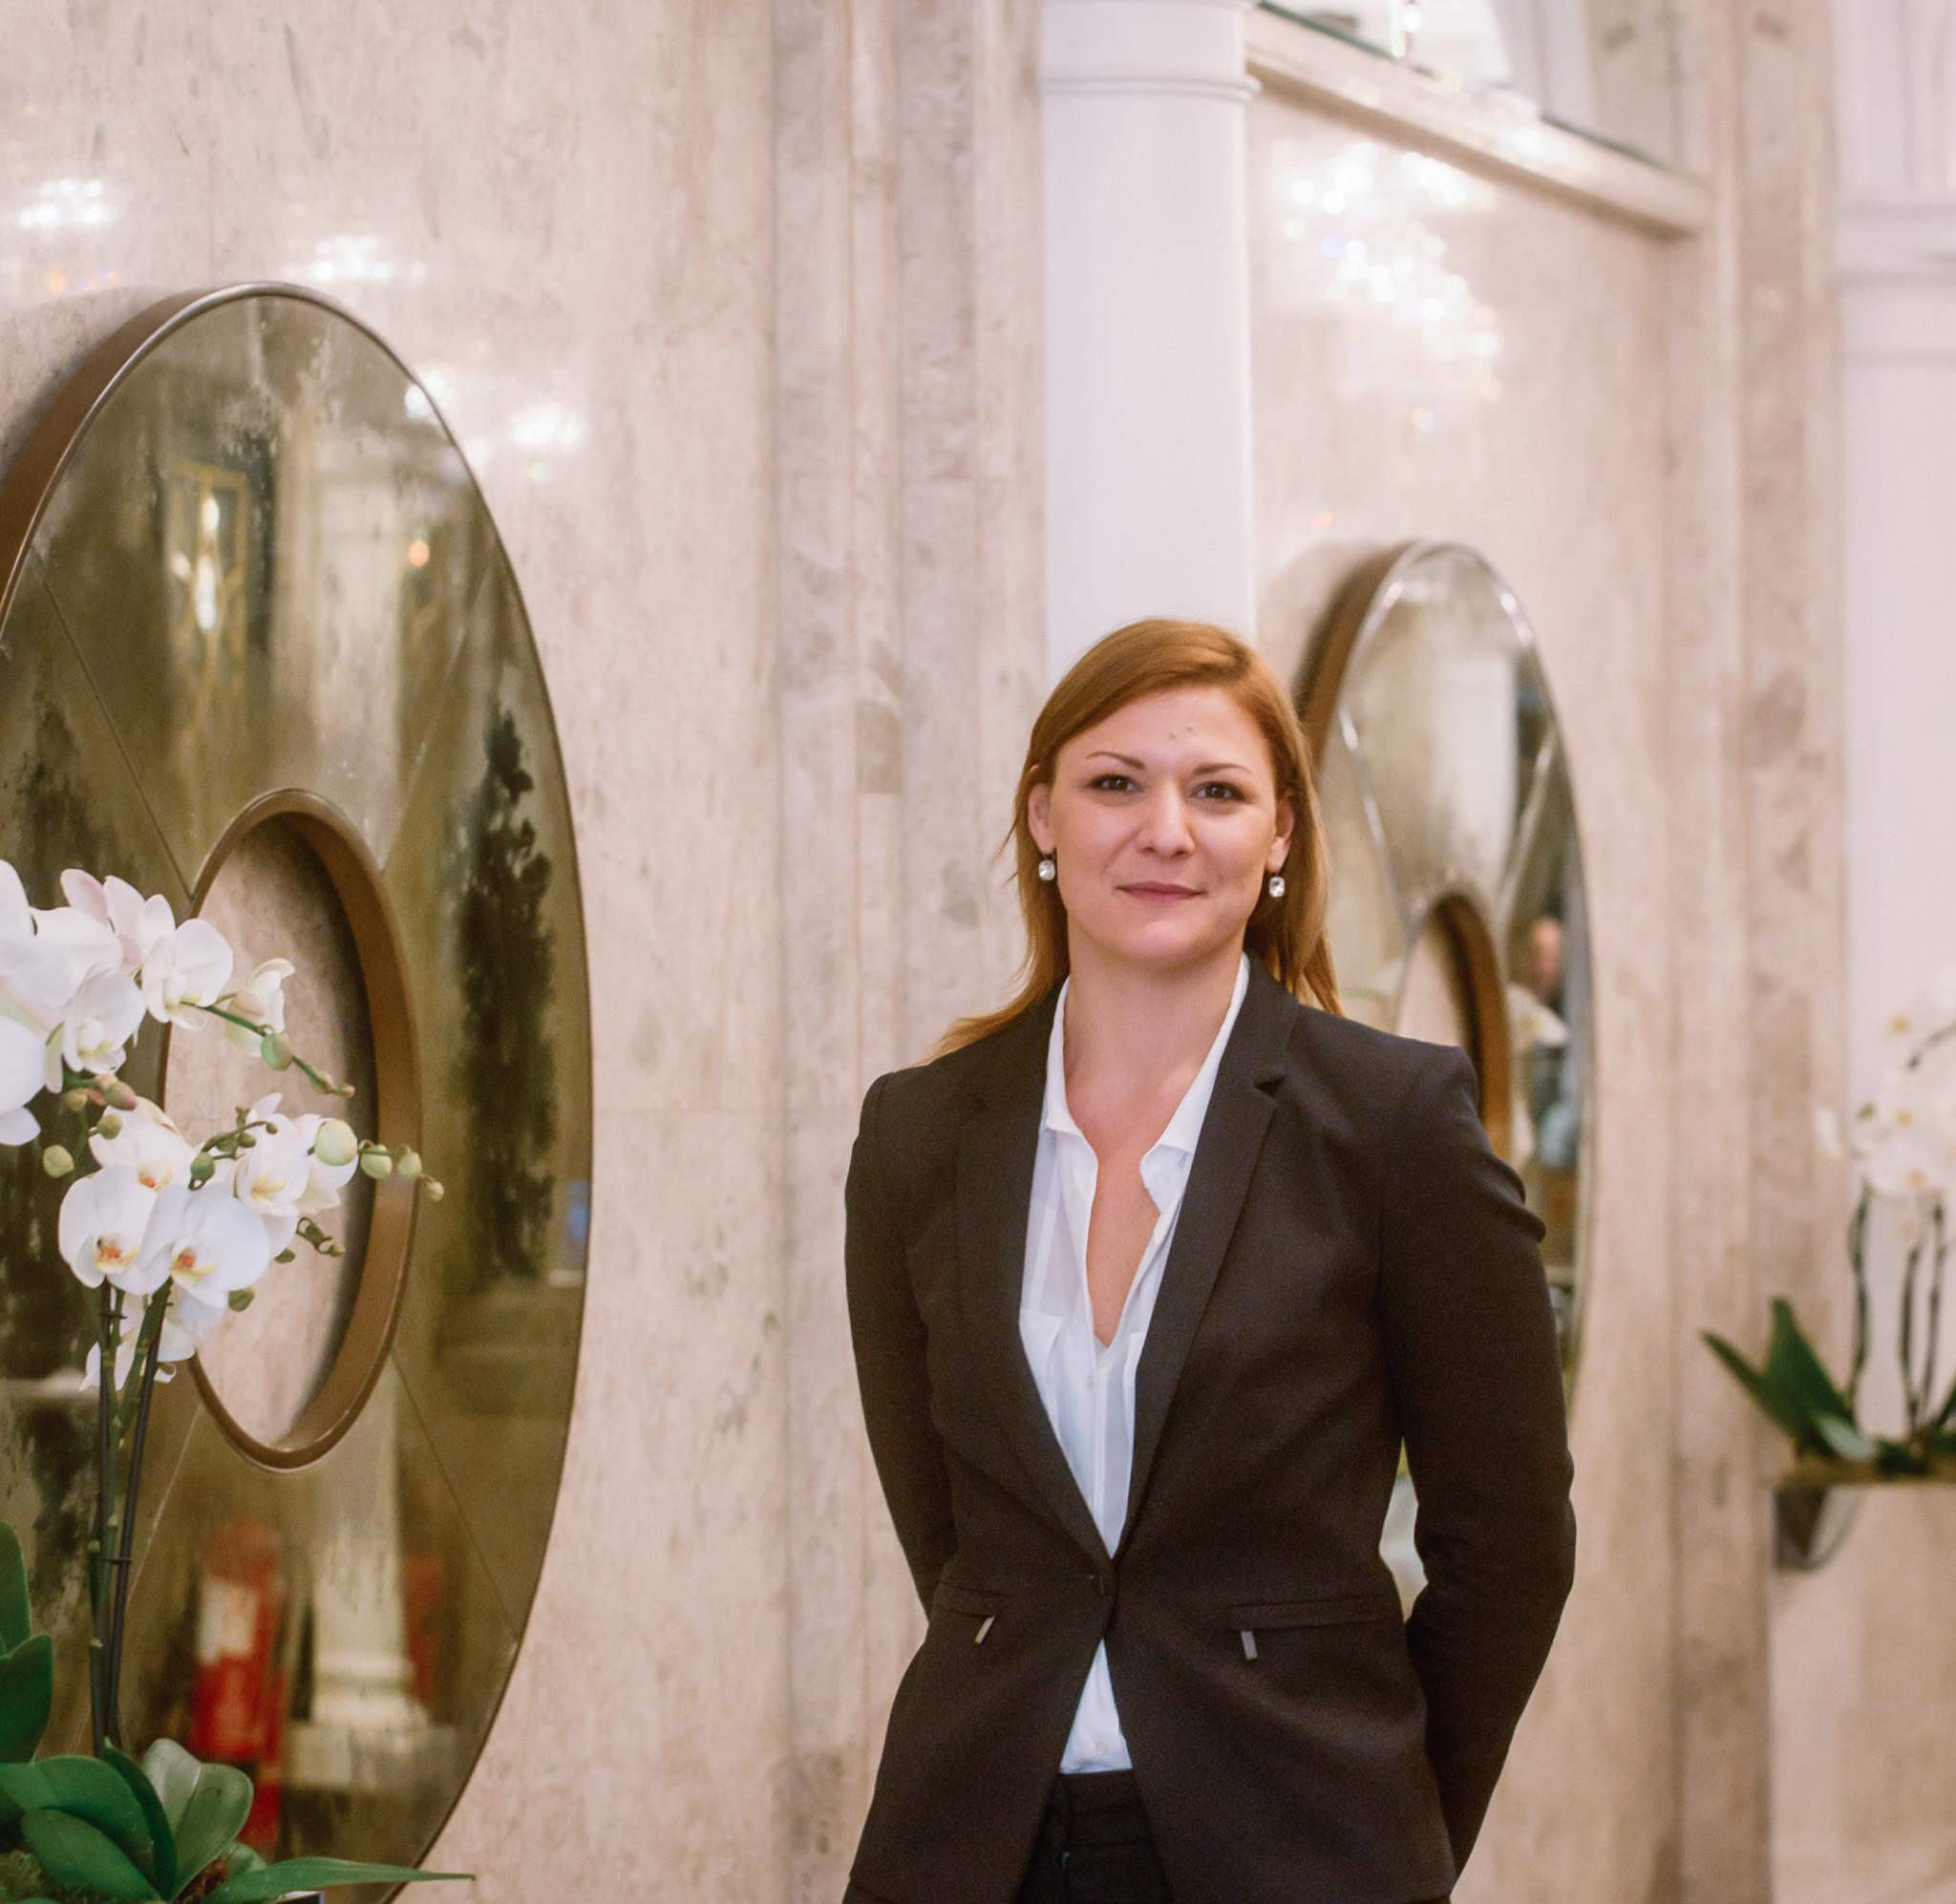 Chiara-The-Wellesley-Knightsbridge-Vierchowod-Operations-Manager-2